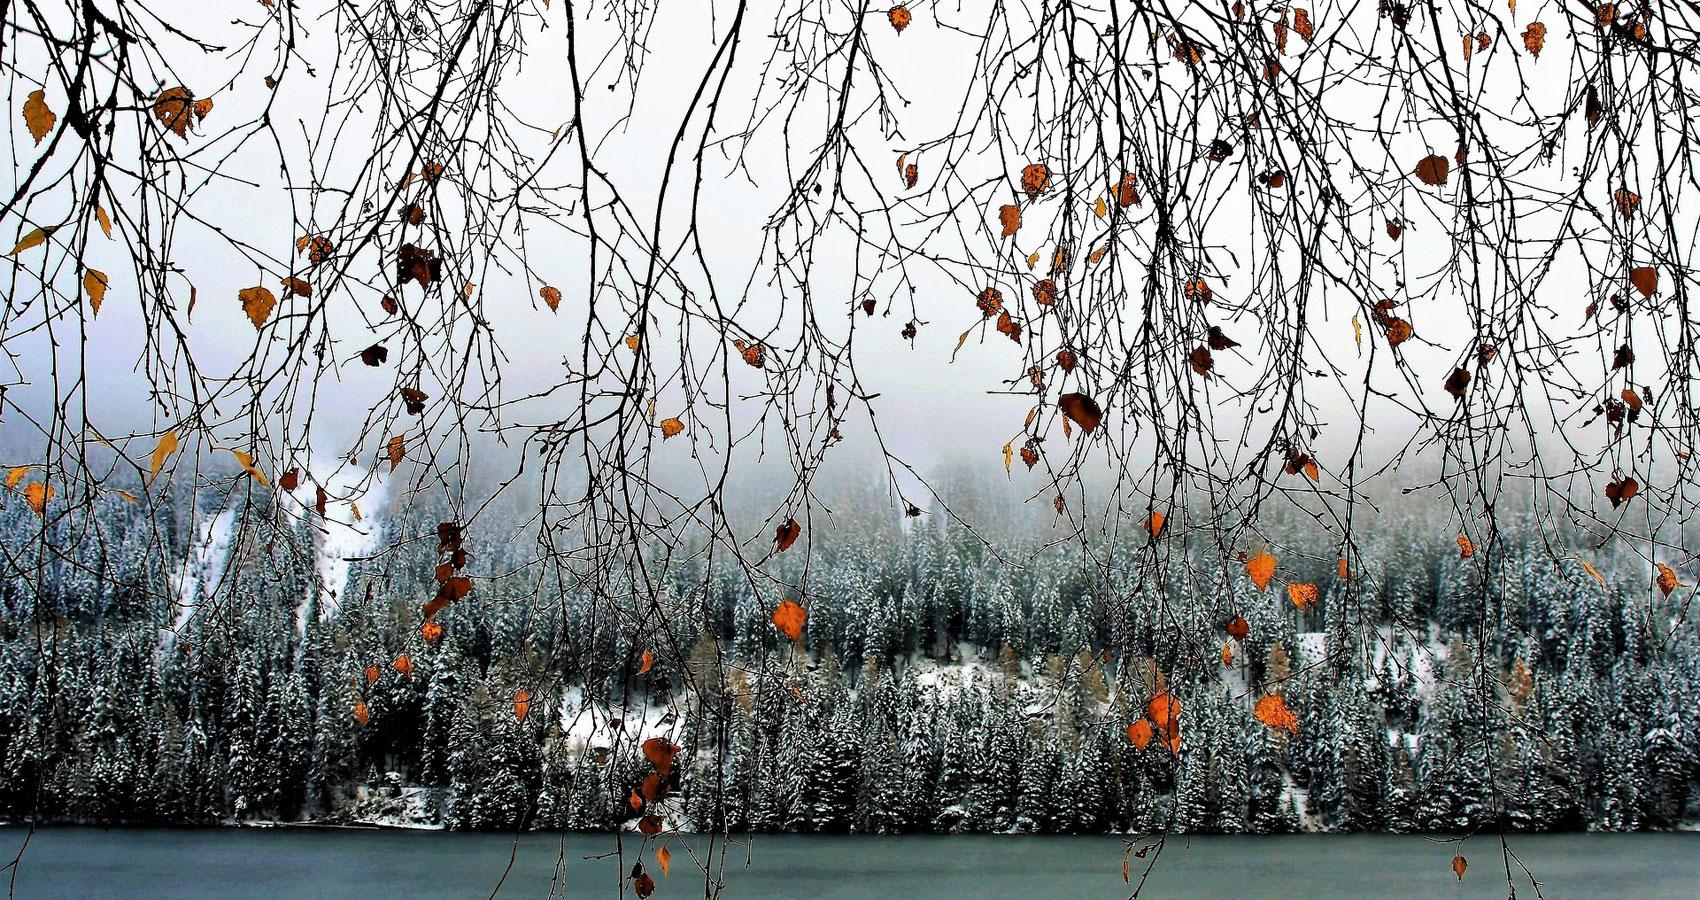 Winter's Dawn, written by Anne G at Spillwords.com